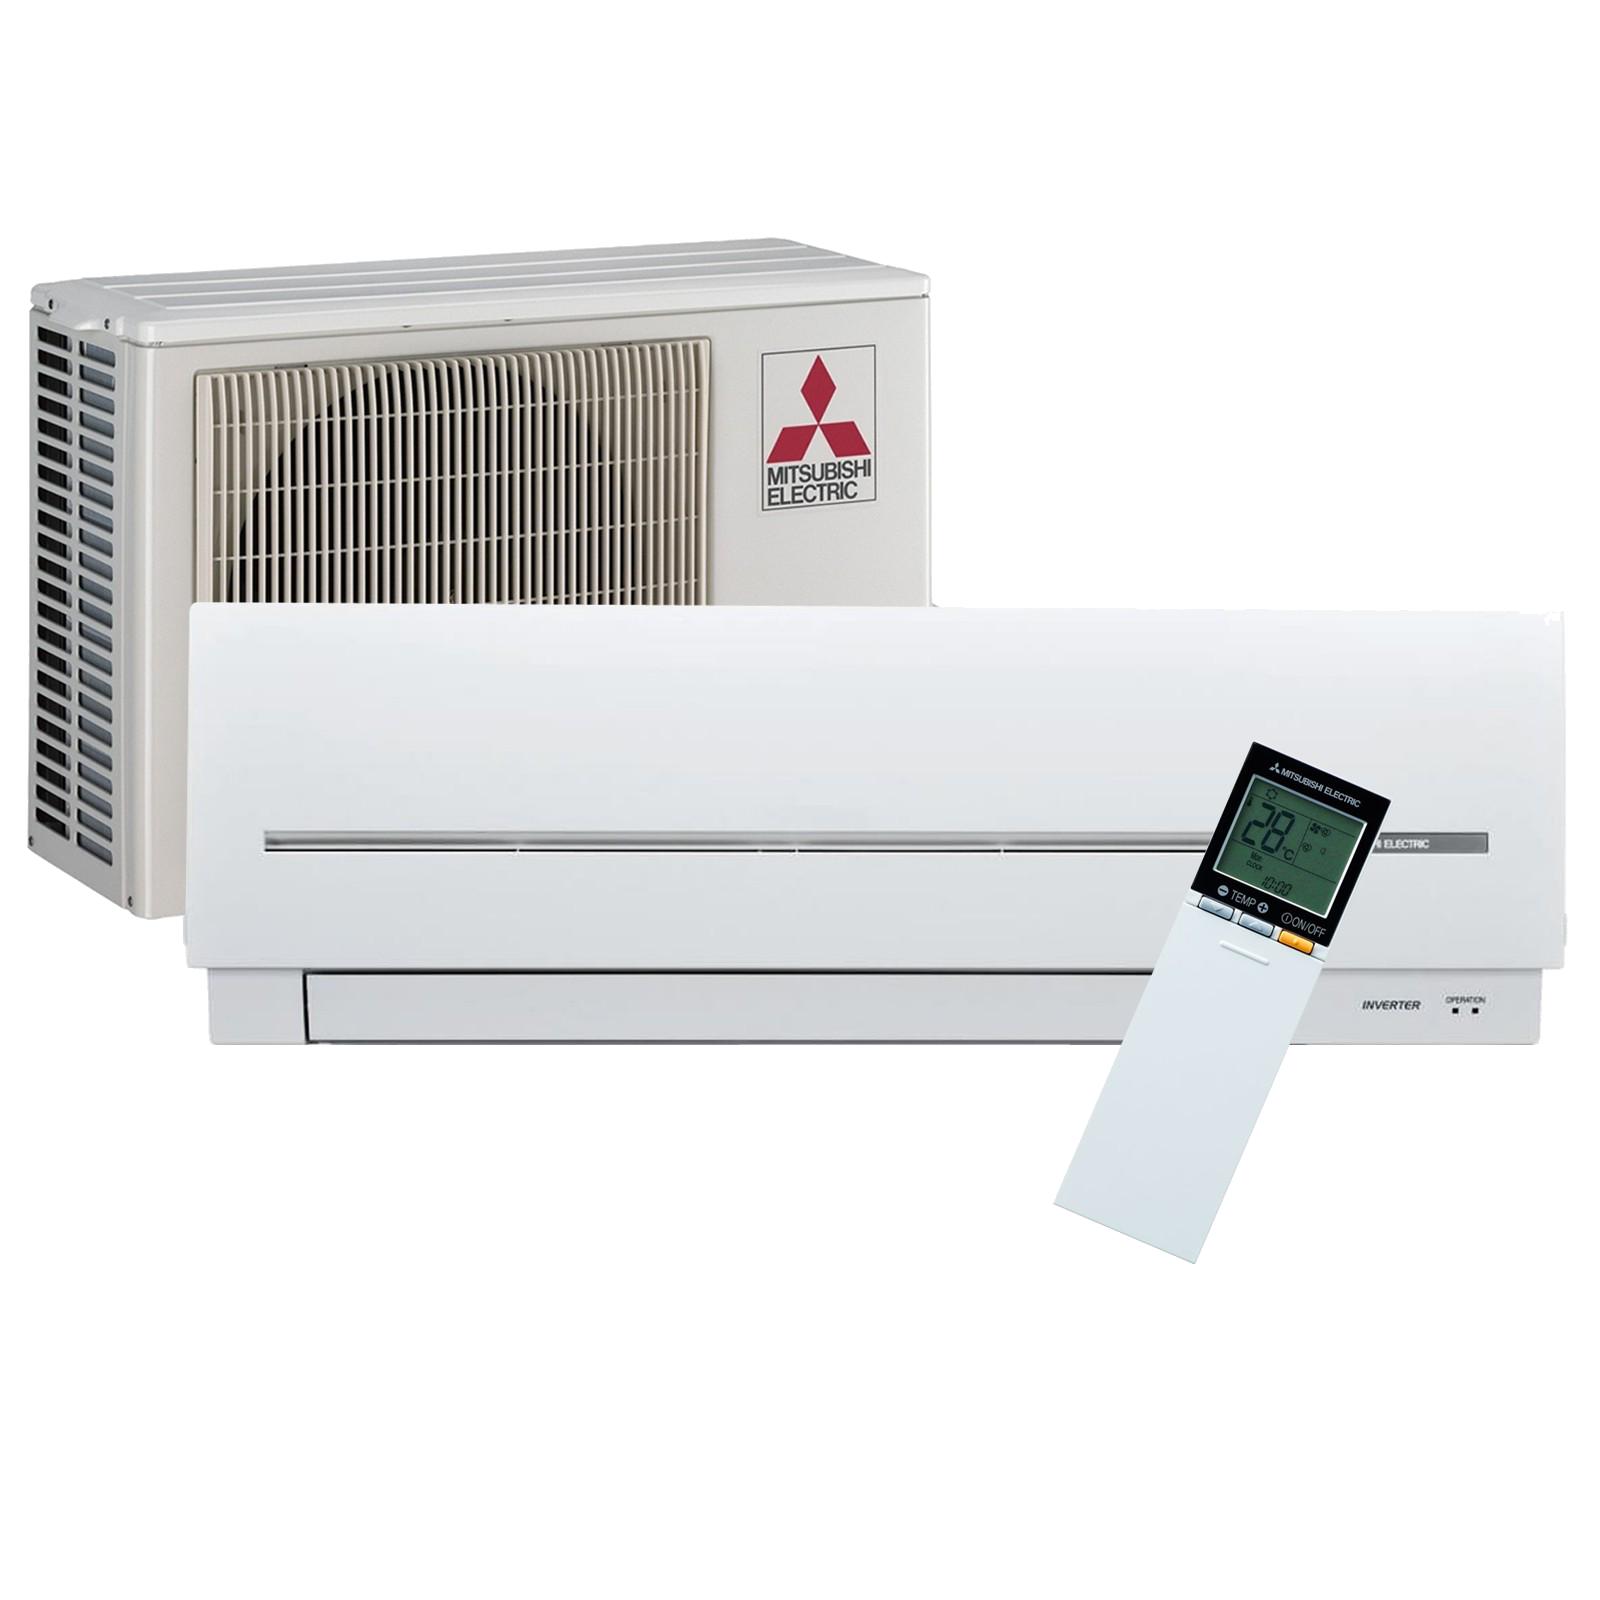 condizionatore-climatizzatore-mitsubishi-electric-inverter-msz-muz-sf42ve-15000-btu